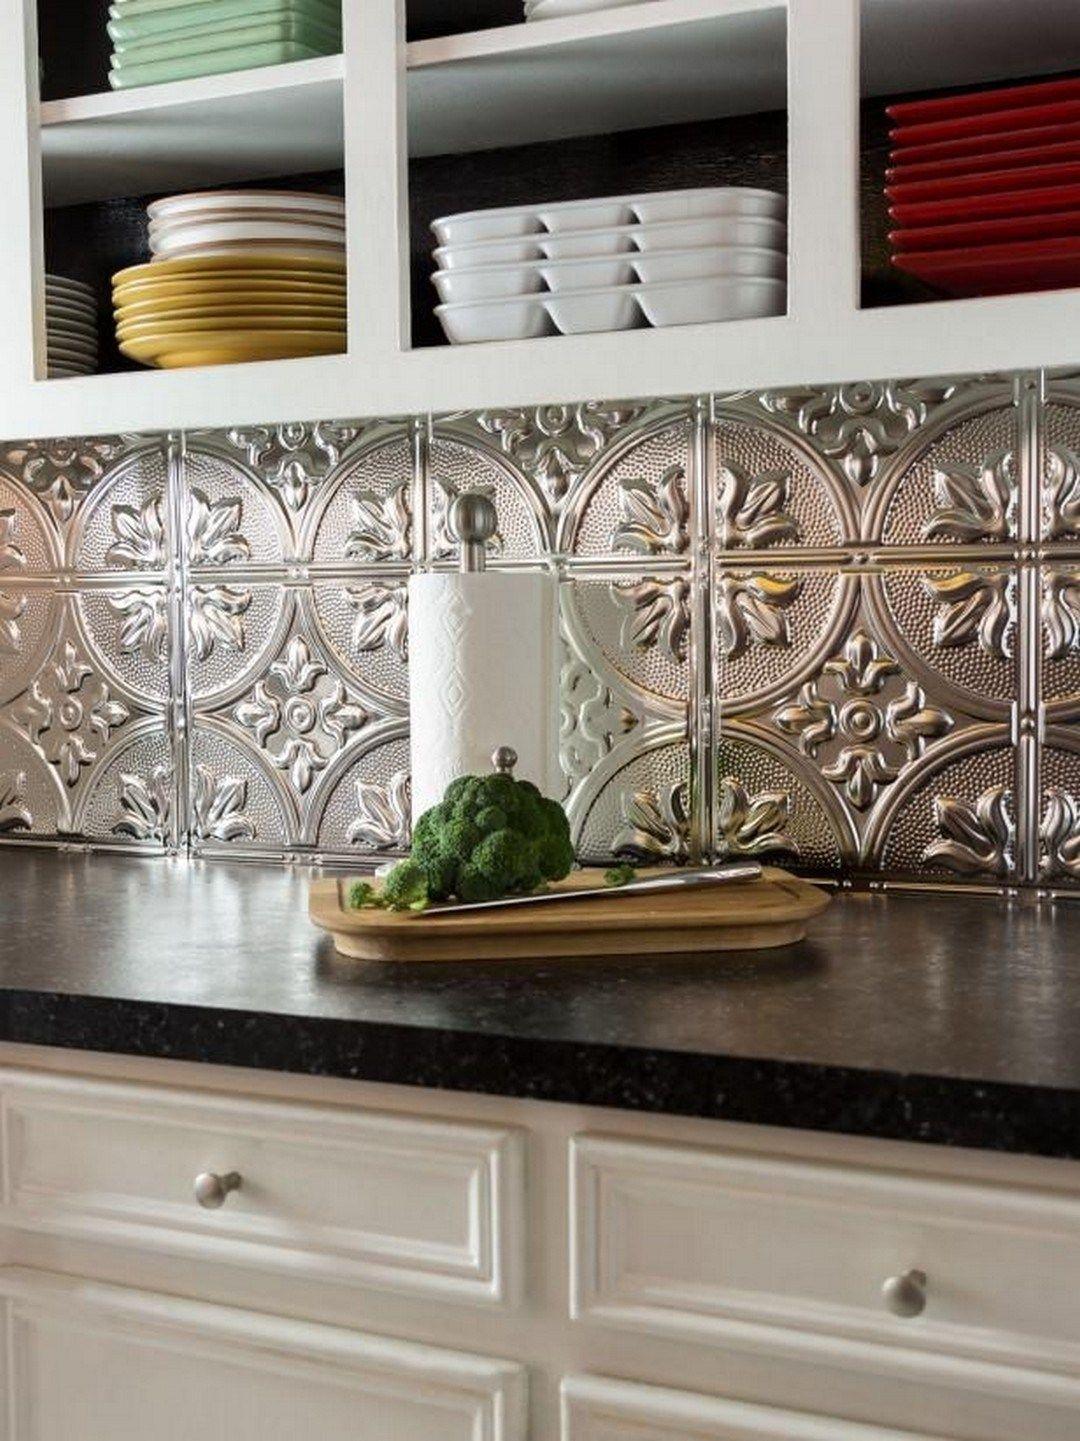 29 Cool Cheap Diy Kitchen Backsplash Ideas 8 Diy Kitchen